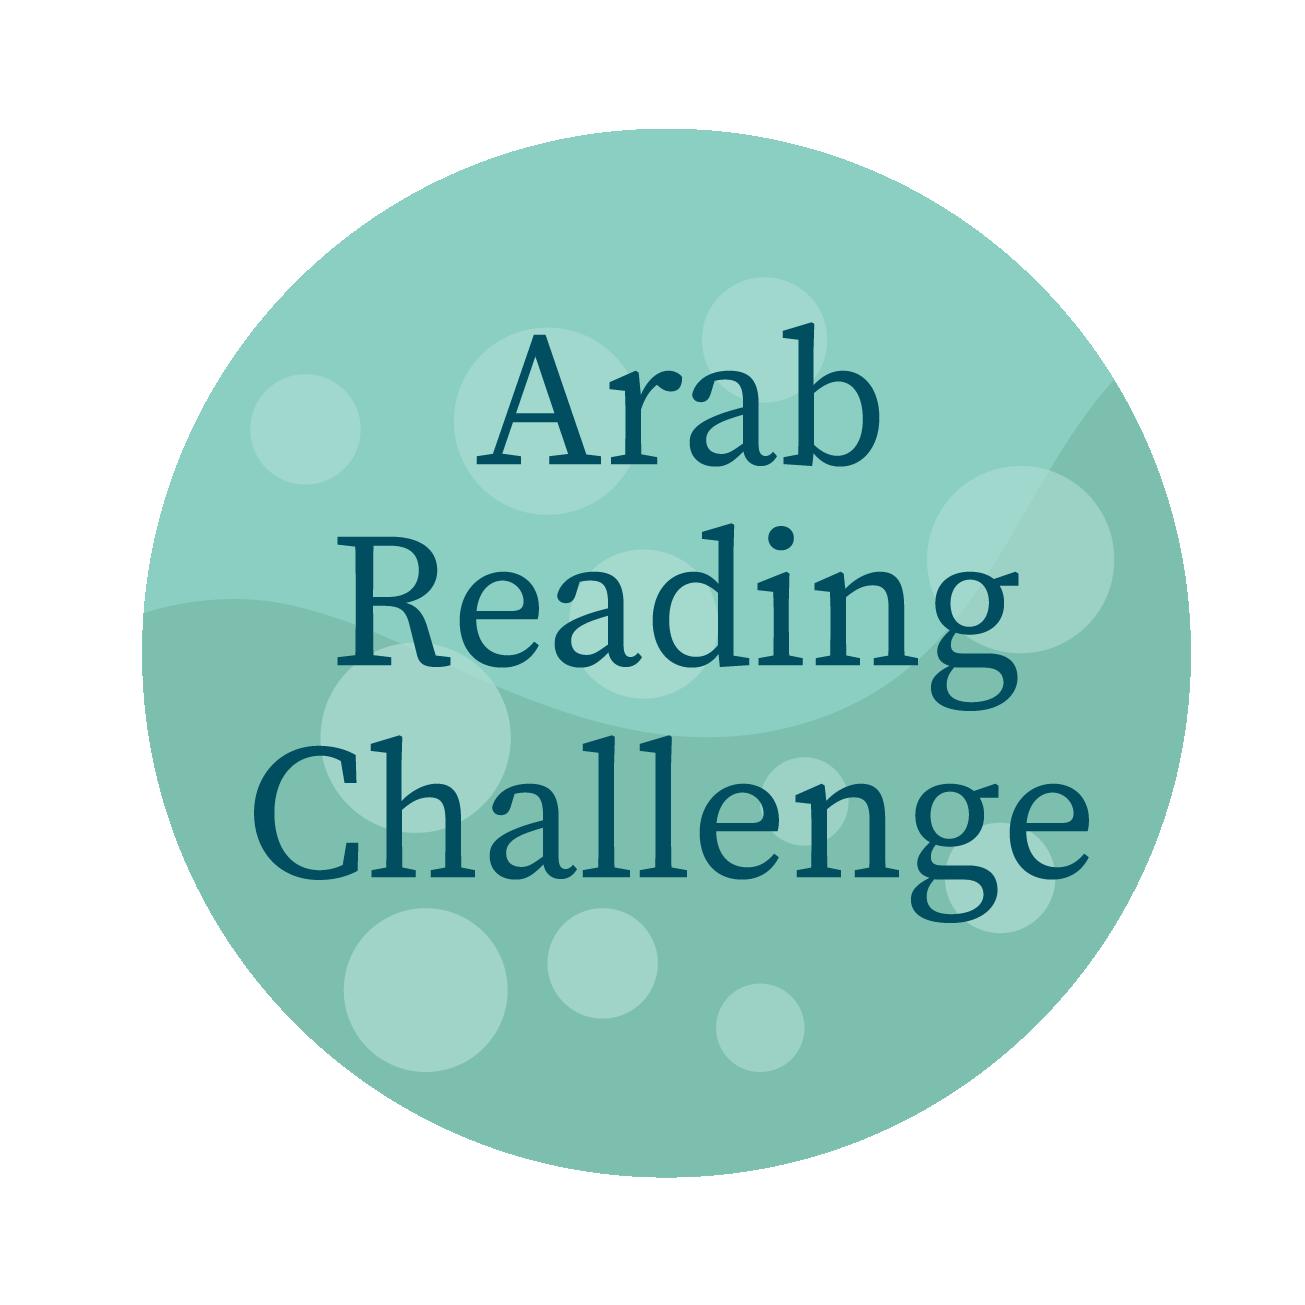 Read Challenge